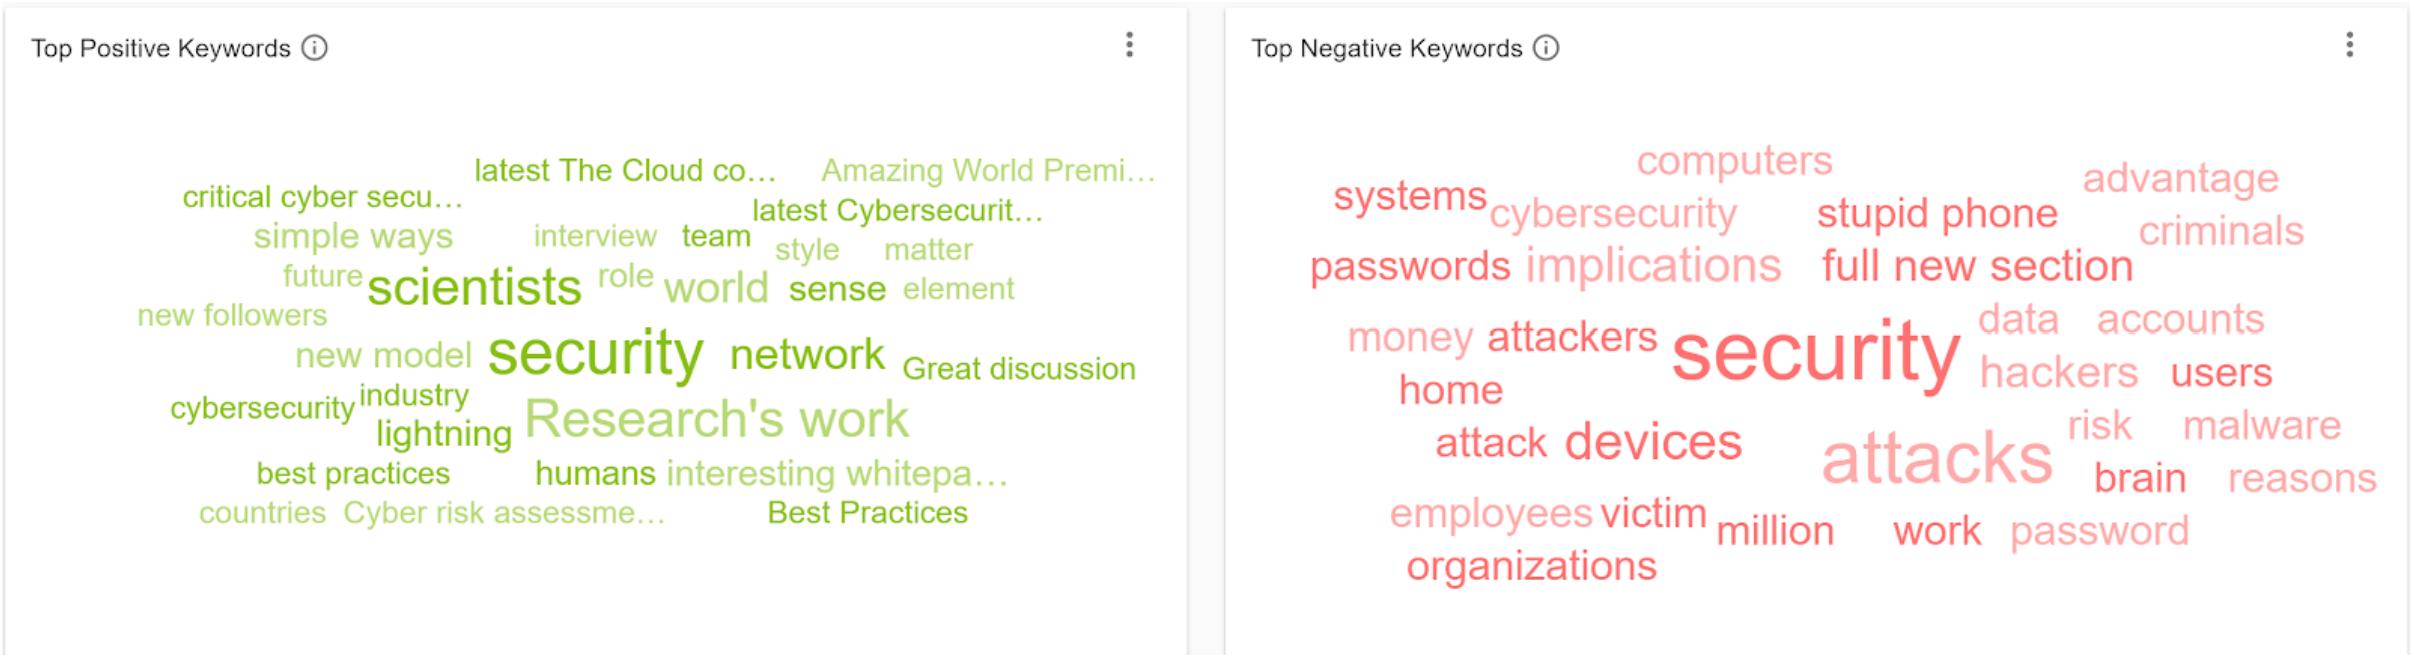 8 Positive Negative Social Listening IOT - Cybersecurity Keywords